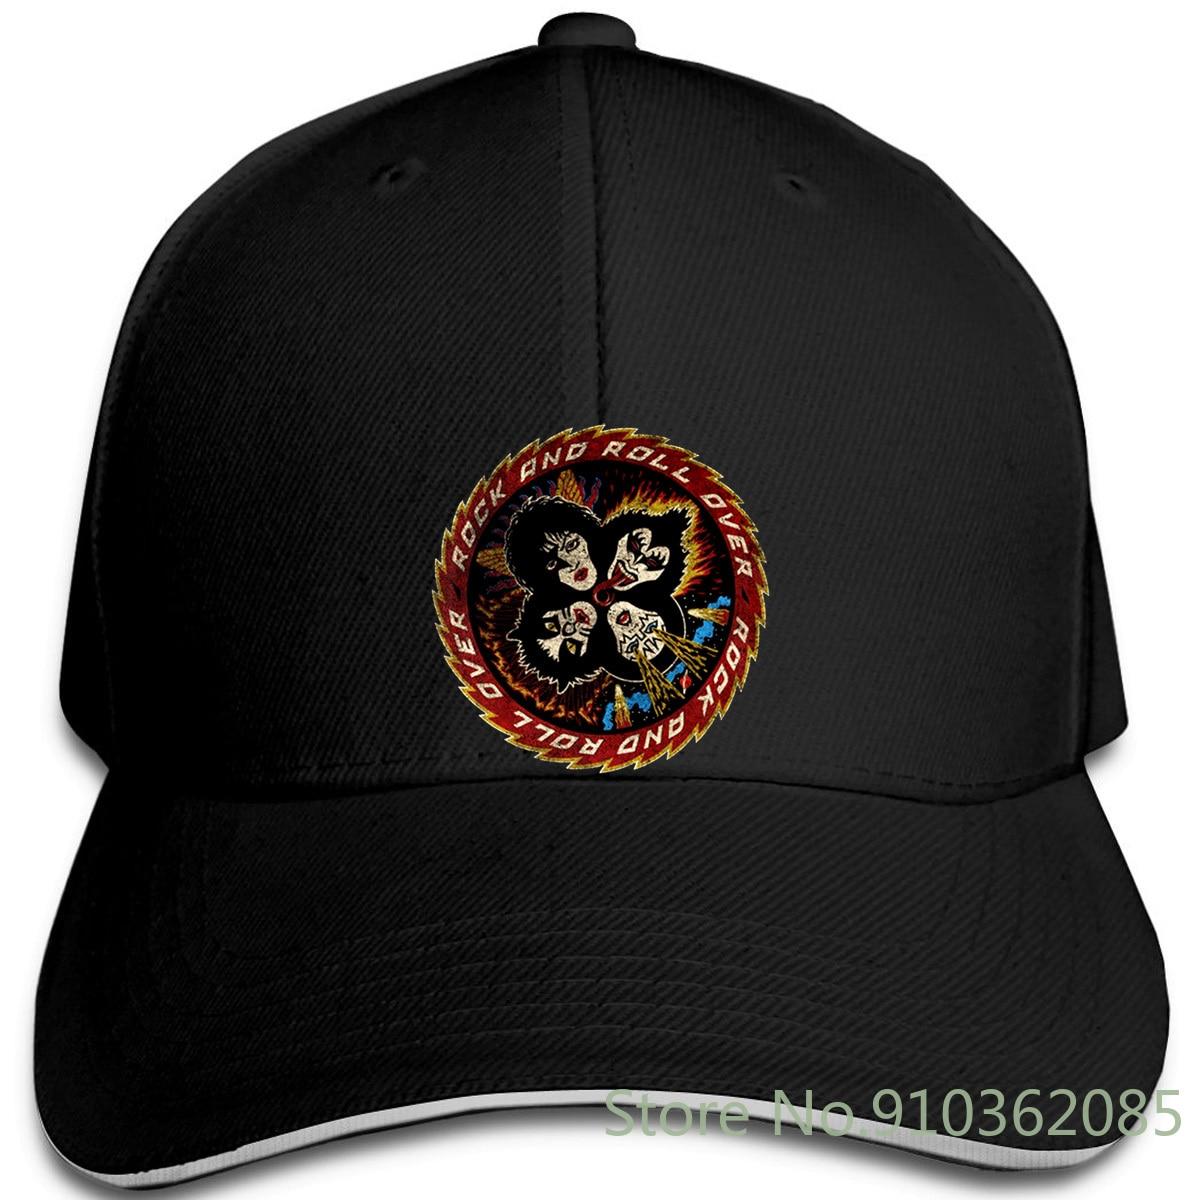 Kiss Rock and Roll Over Gene Simmons gorras de béisbol Unisex oficiales para hombres y mujeres